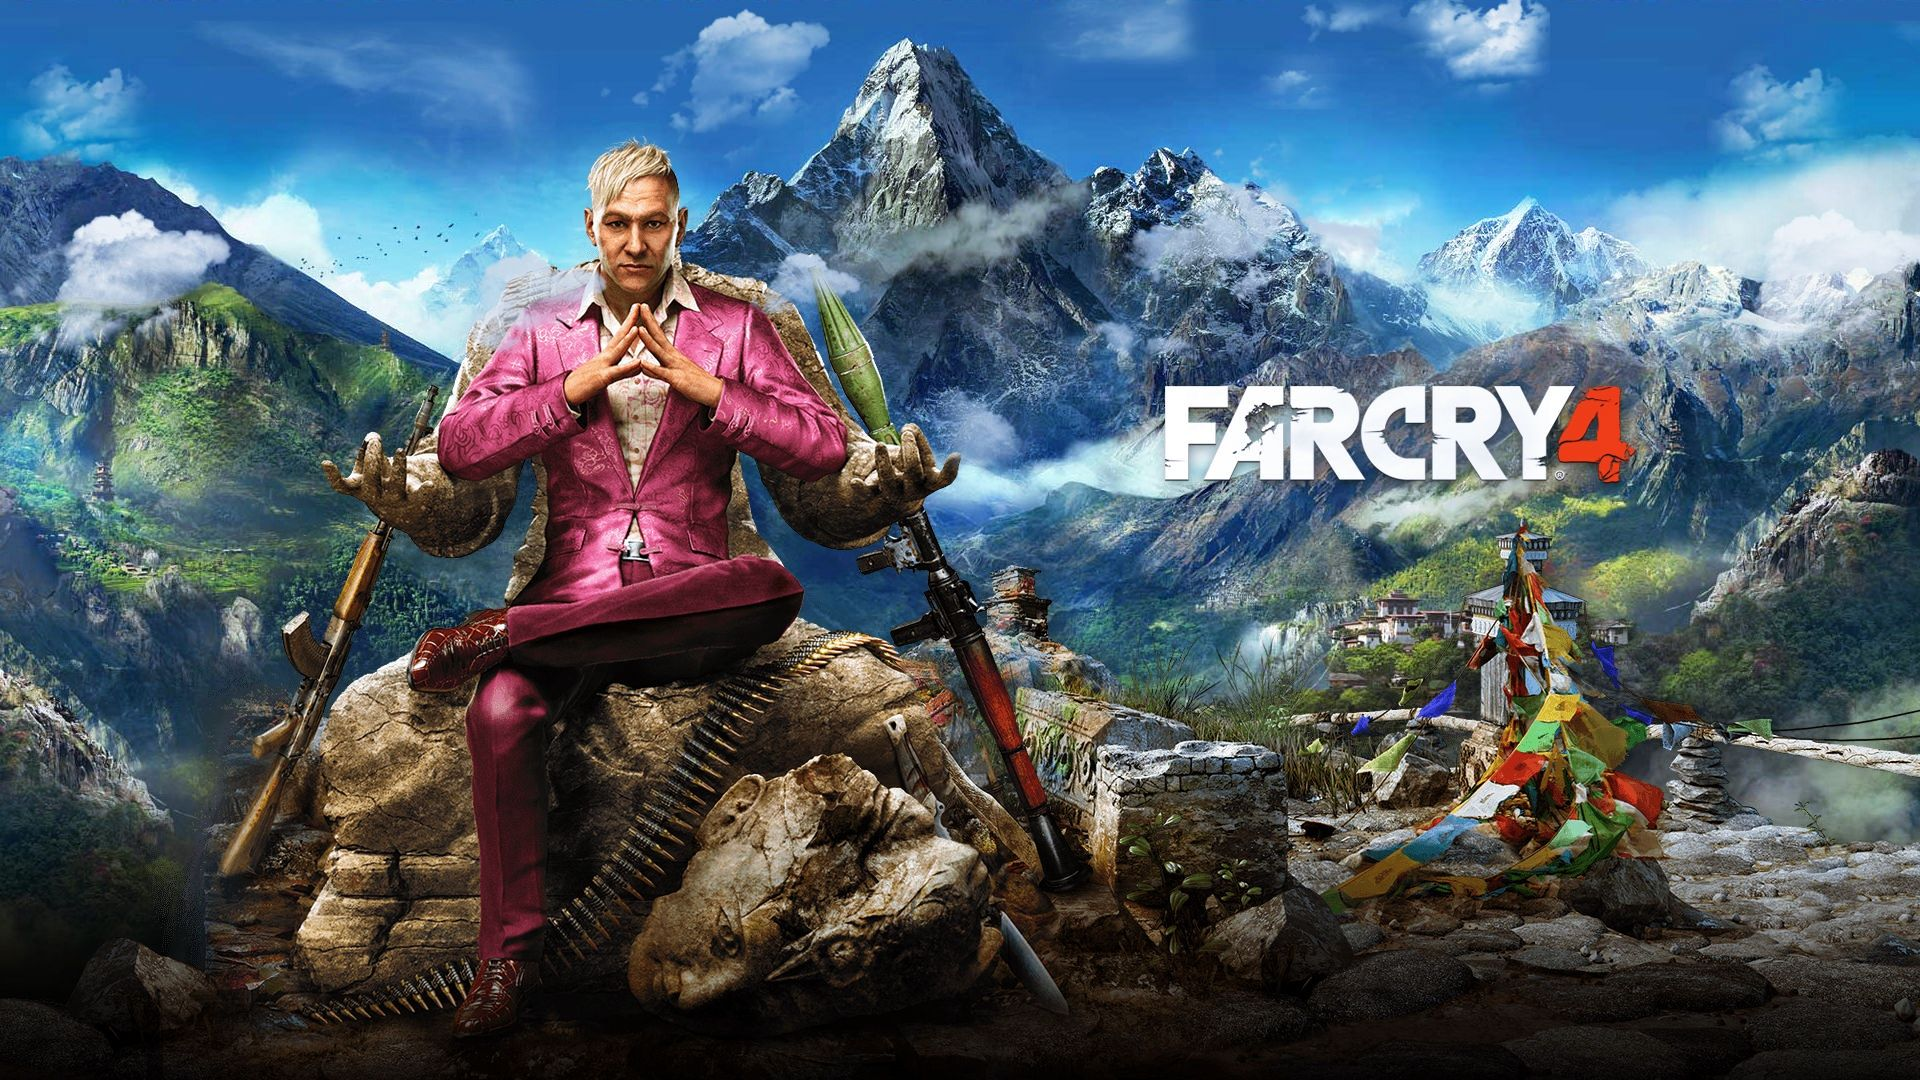 far cry 4 review gamerschoice von gamern f r gamer. Black Bedroom Furniture Sets. Home Design Ideas